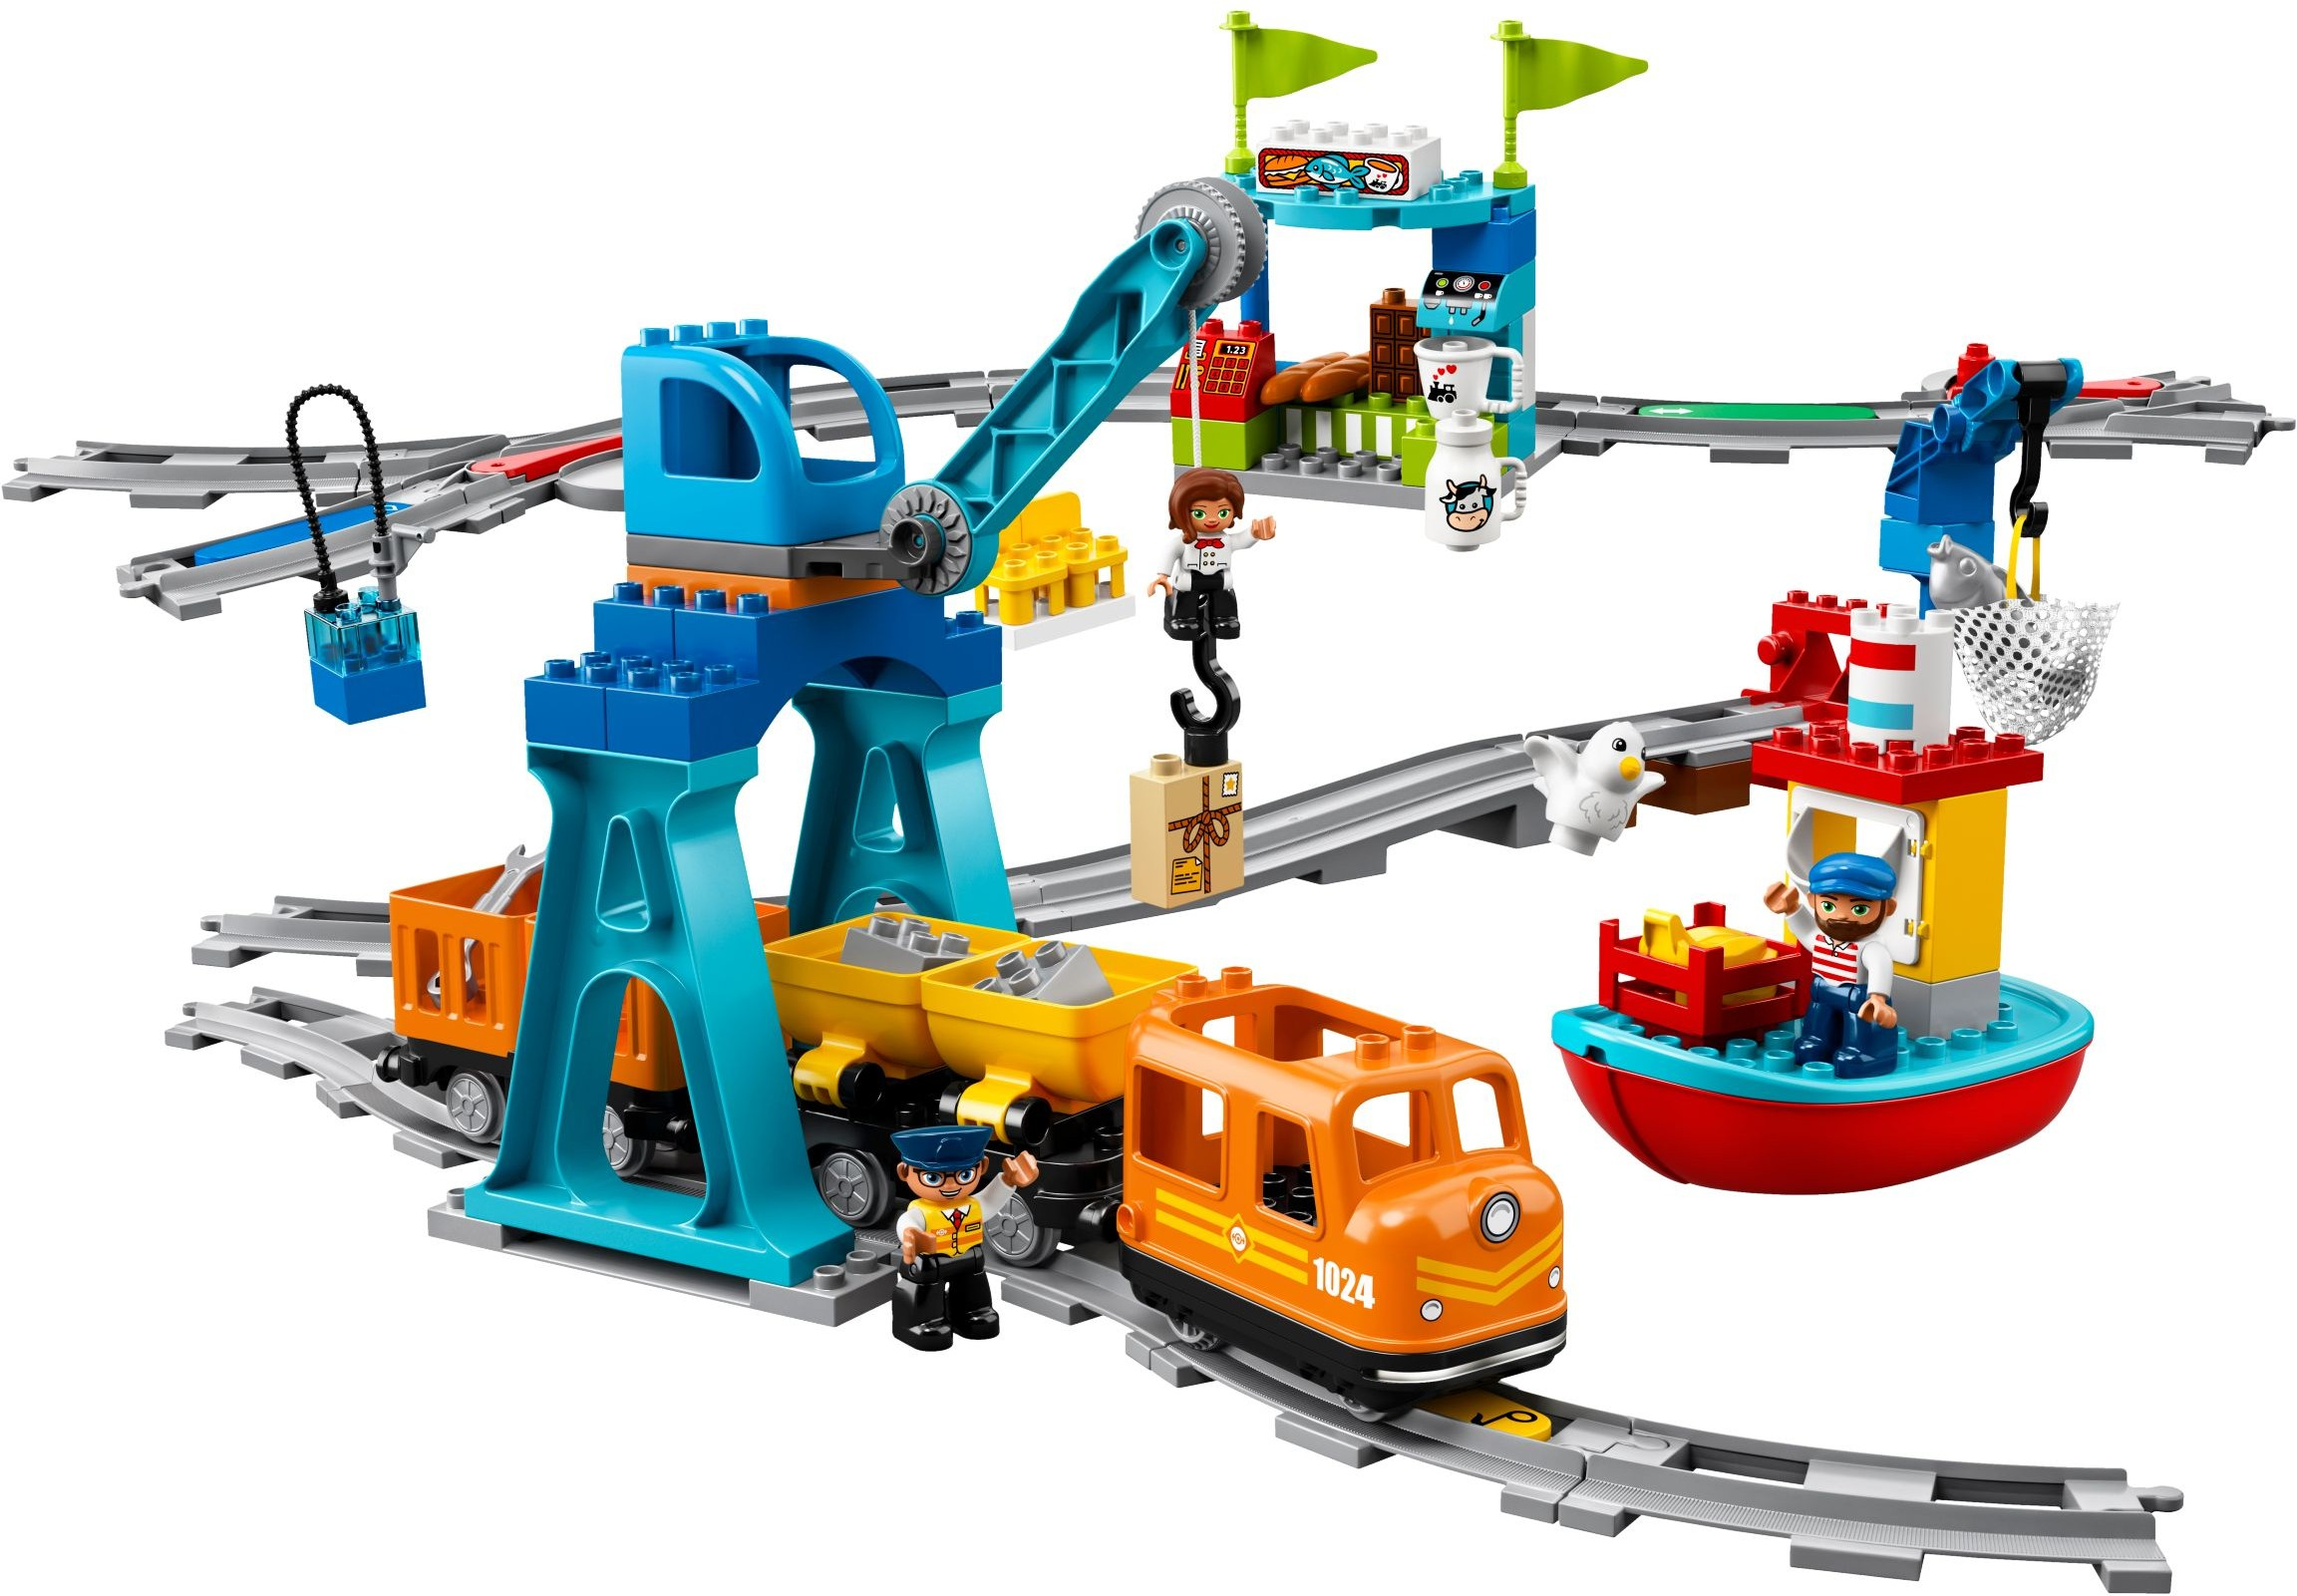 Lego Duplo Train Interesting Starter Set The 5547 James Celebrates Sodor Day Cargo With